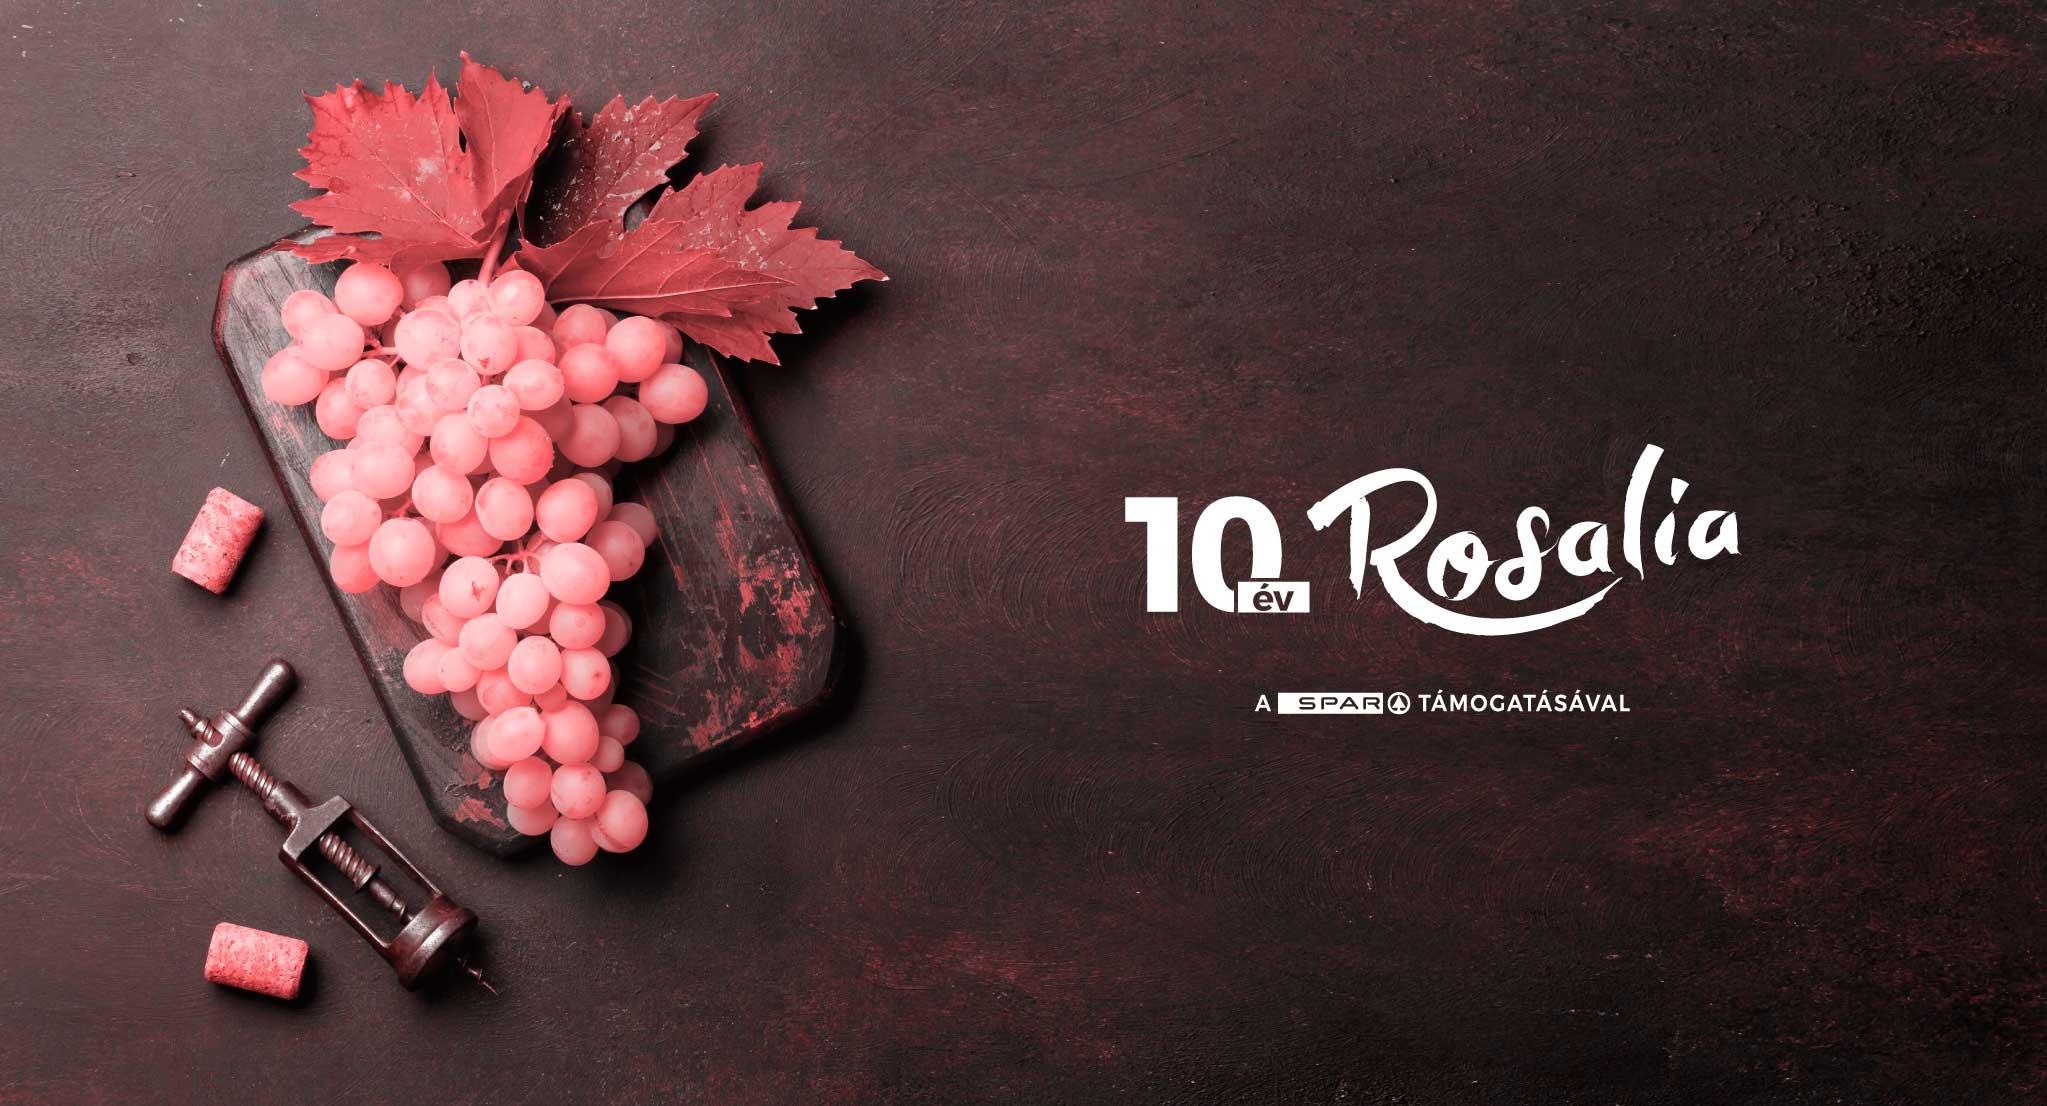 Rosalia Festival